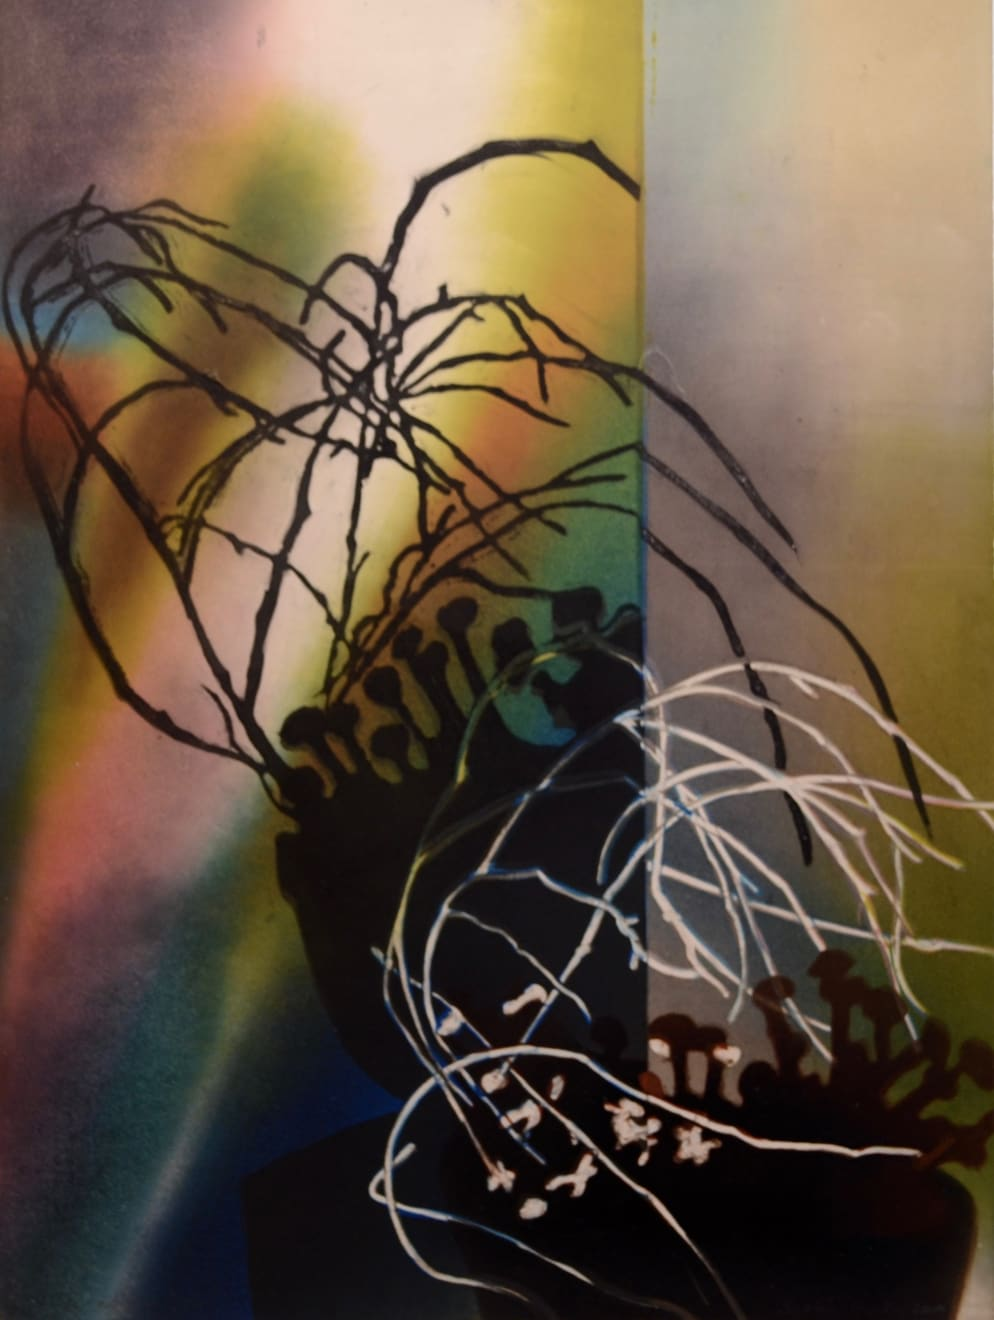 Sophie Layton, Still Life - Willow Detail, 2019